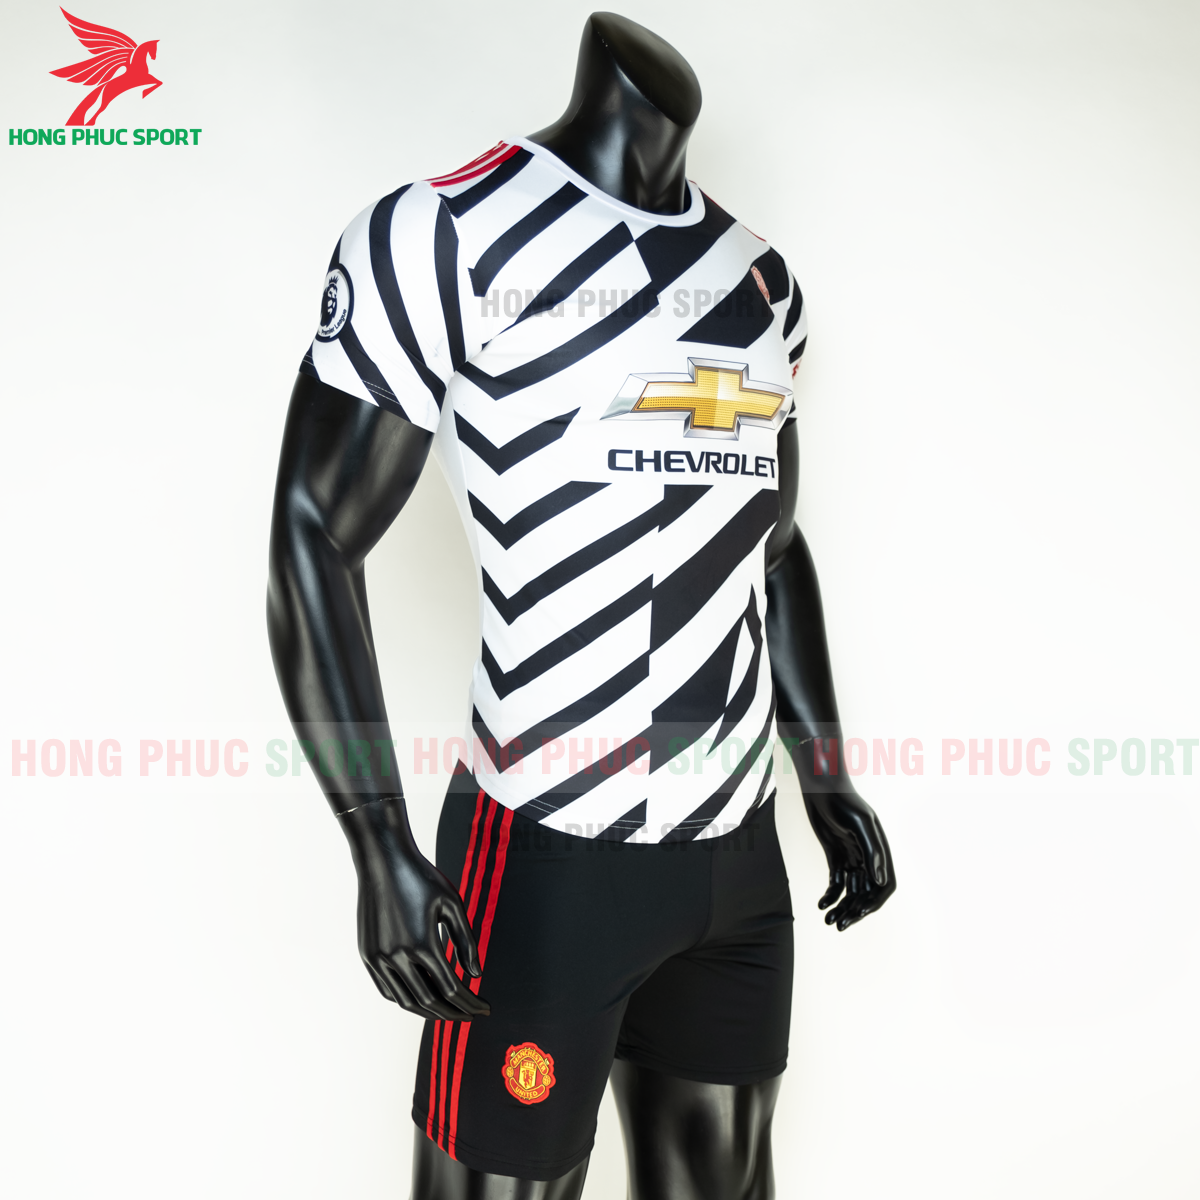 https://cdn.hongphucsport.com/unsafe/s4.shopbay.vn/files/285/ao-da-bong-manchester-united-2020-2021-mau-thu-3-6-5fe1b315be5d6.png